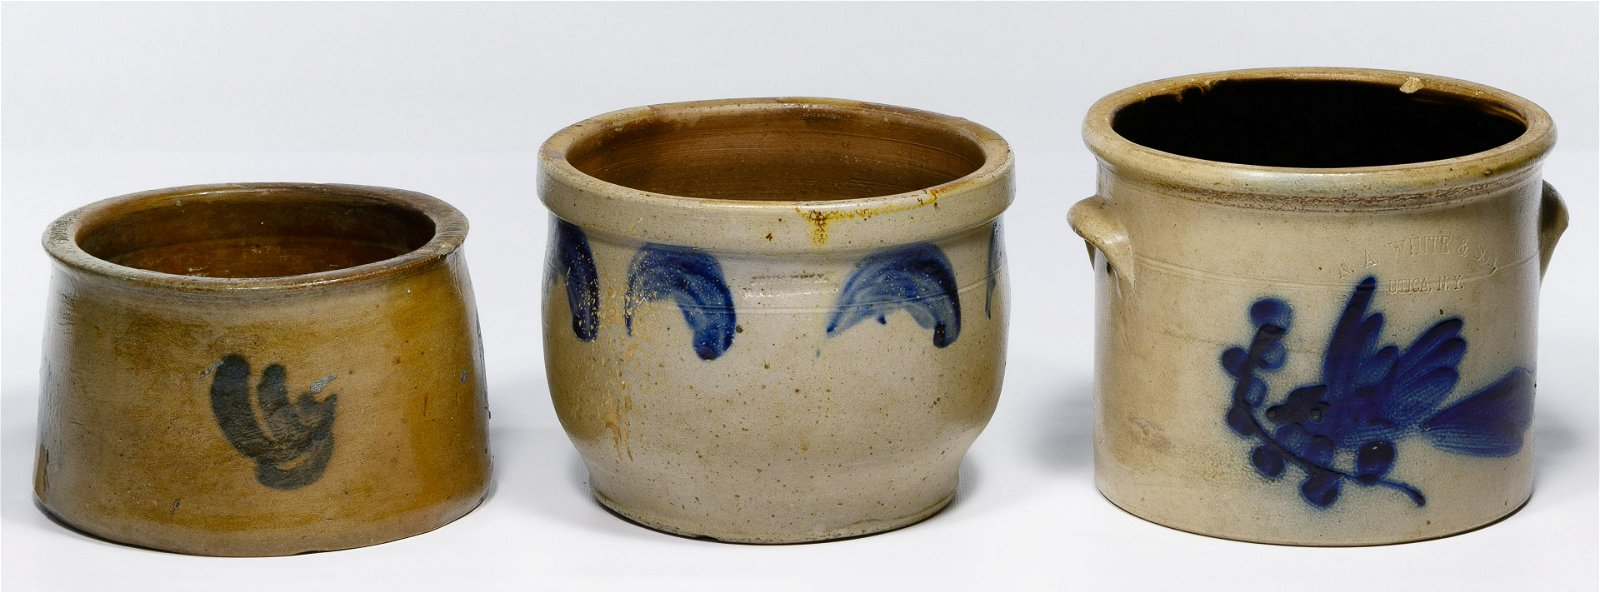 Cobalt Blue Stoneware Assortment